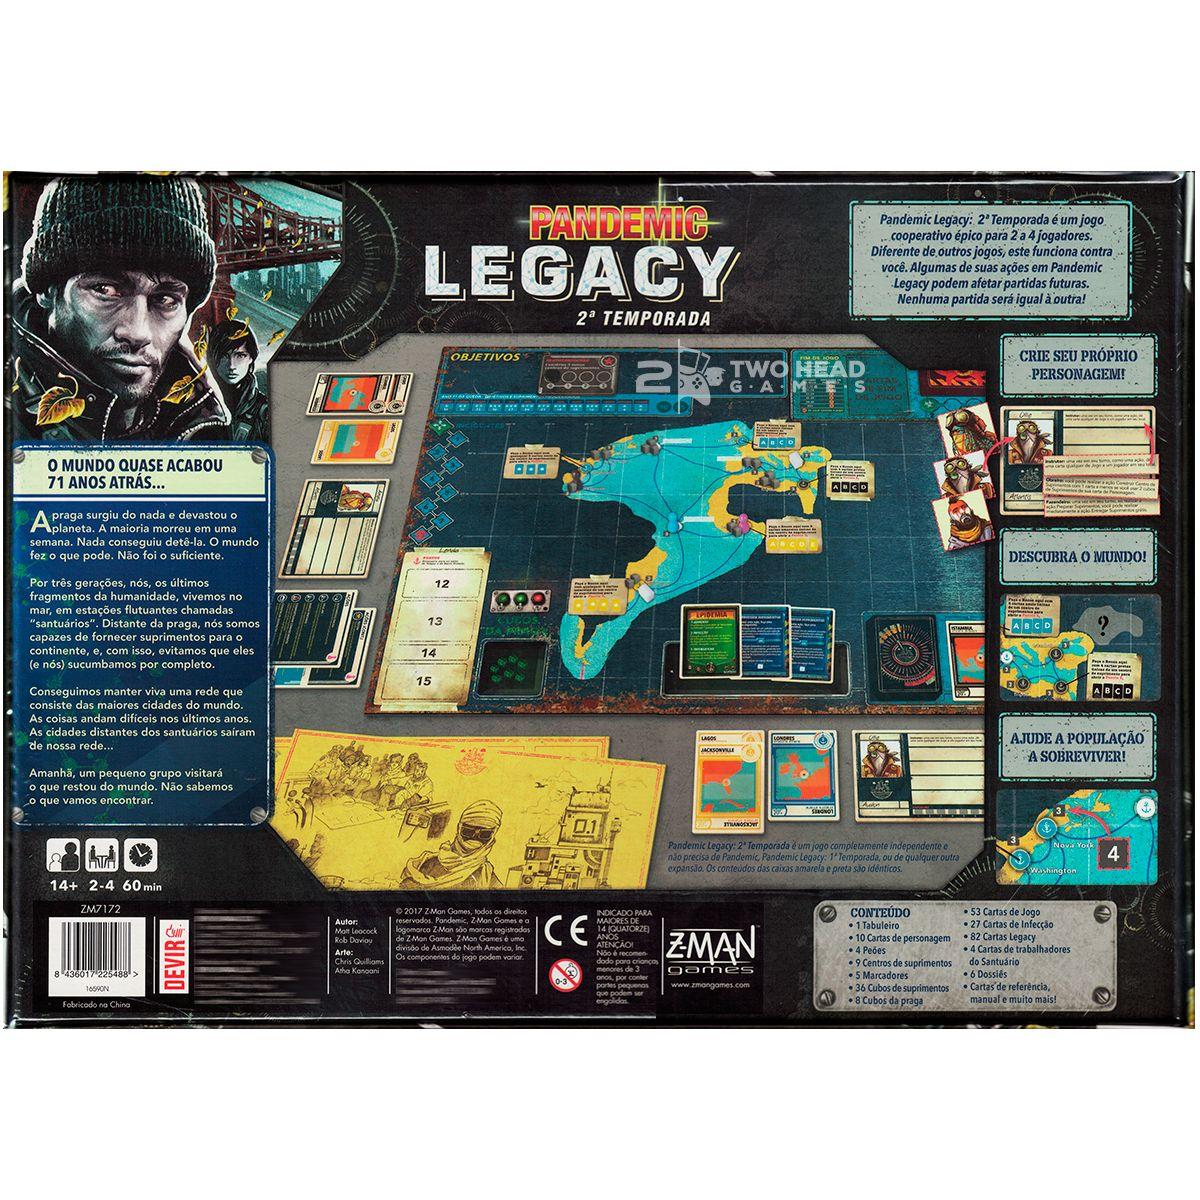 Pandemic Legacy 2ª Temporada Black Jogo de Tabuleiro Devir